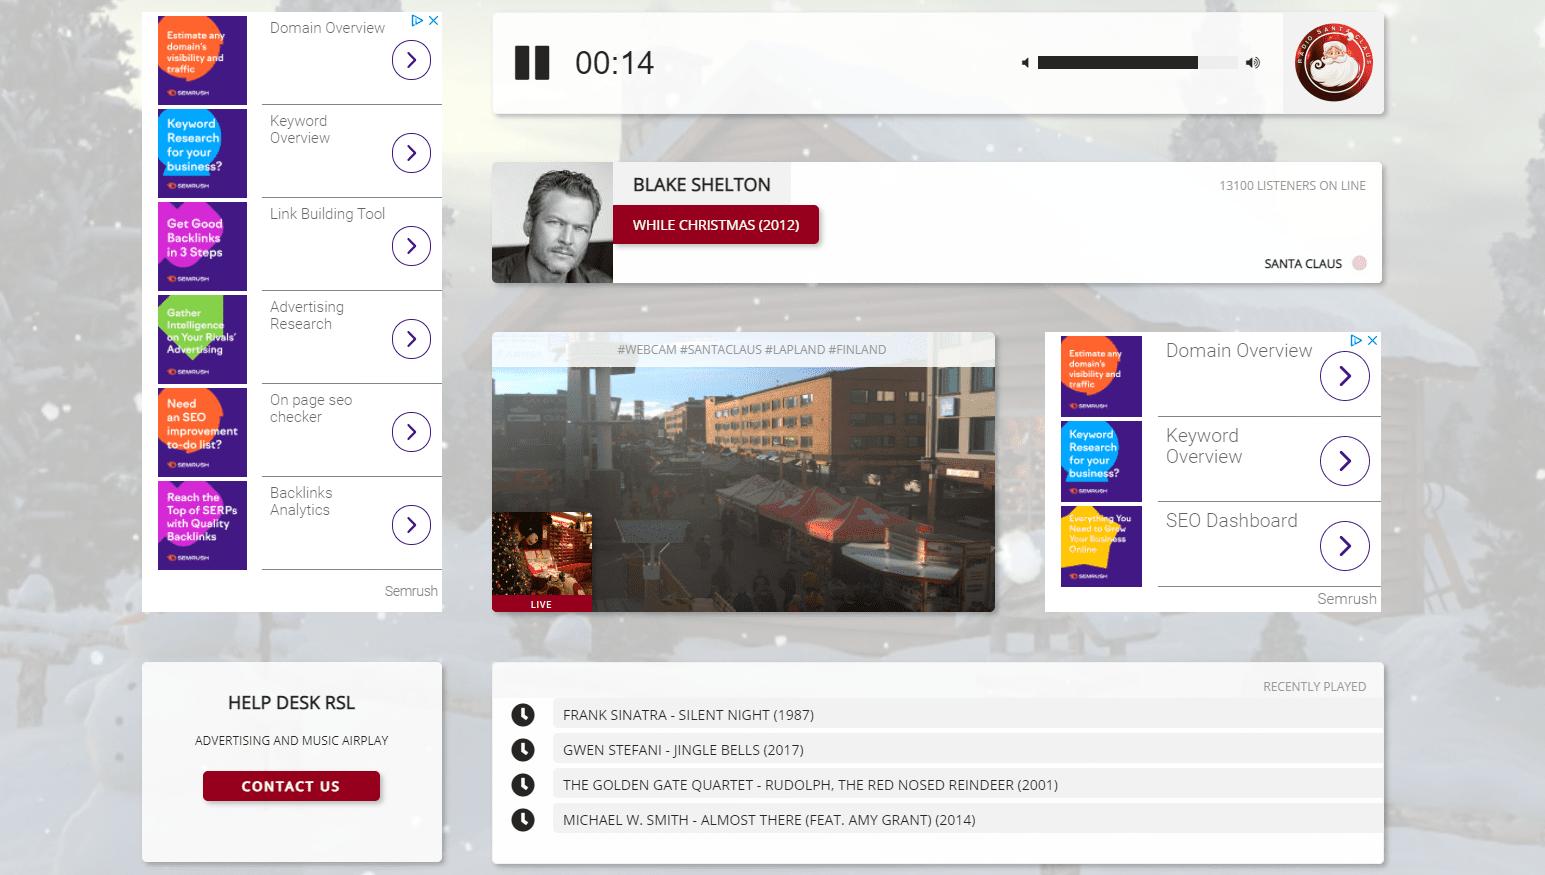 Radio Santa Claus online radio station